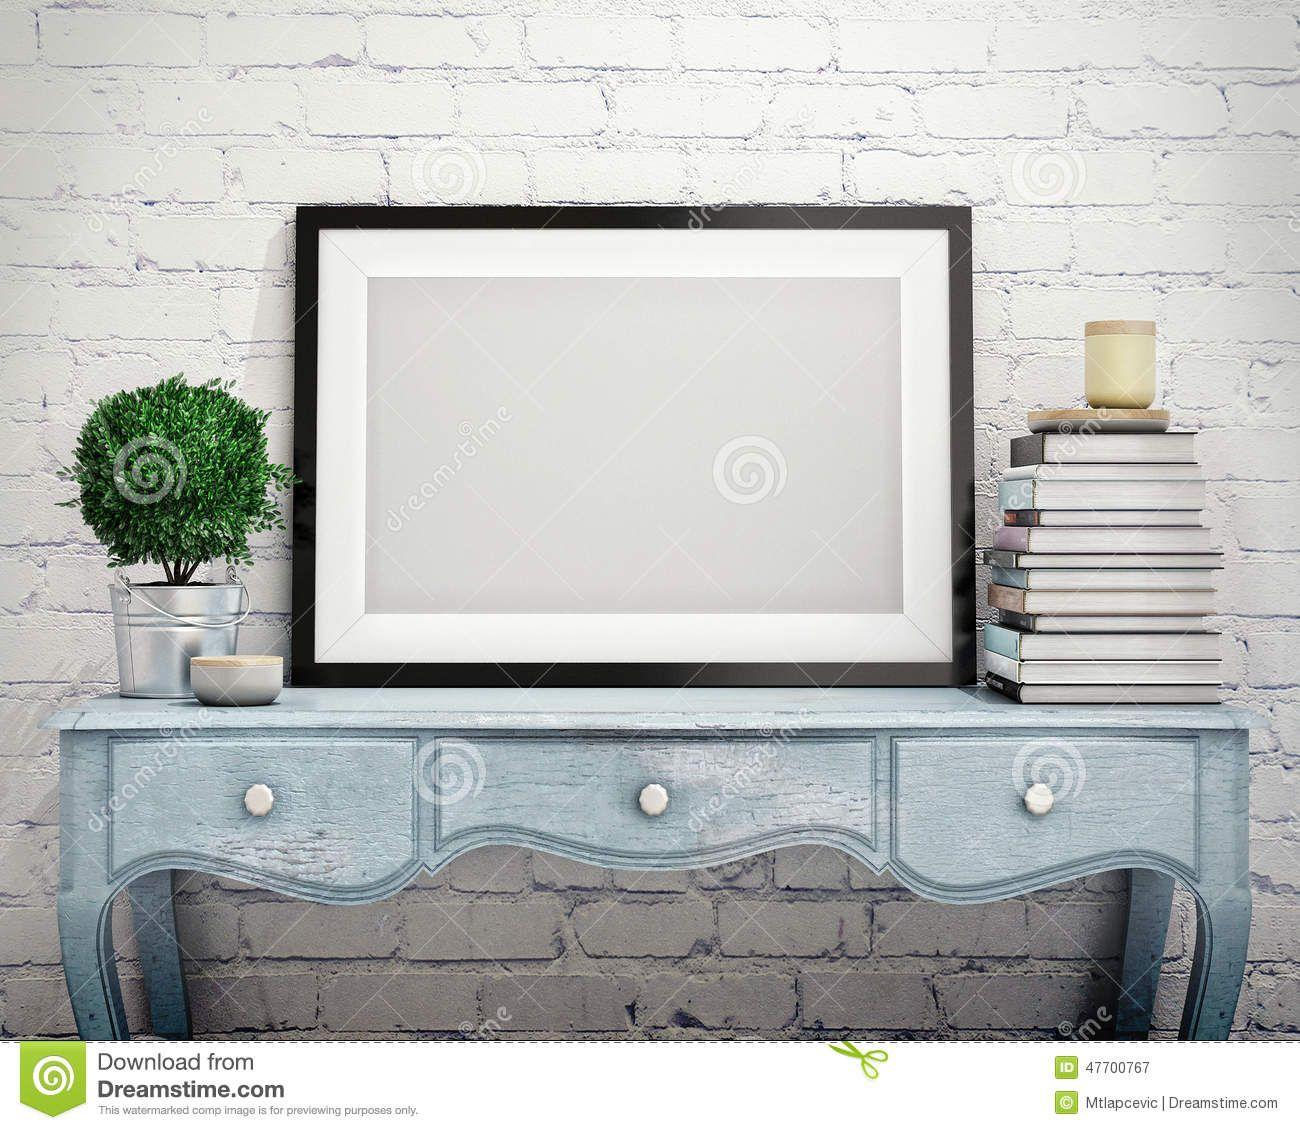 . Mock up poster frame on vintage chest of drawers  interior